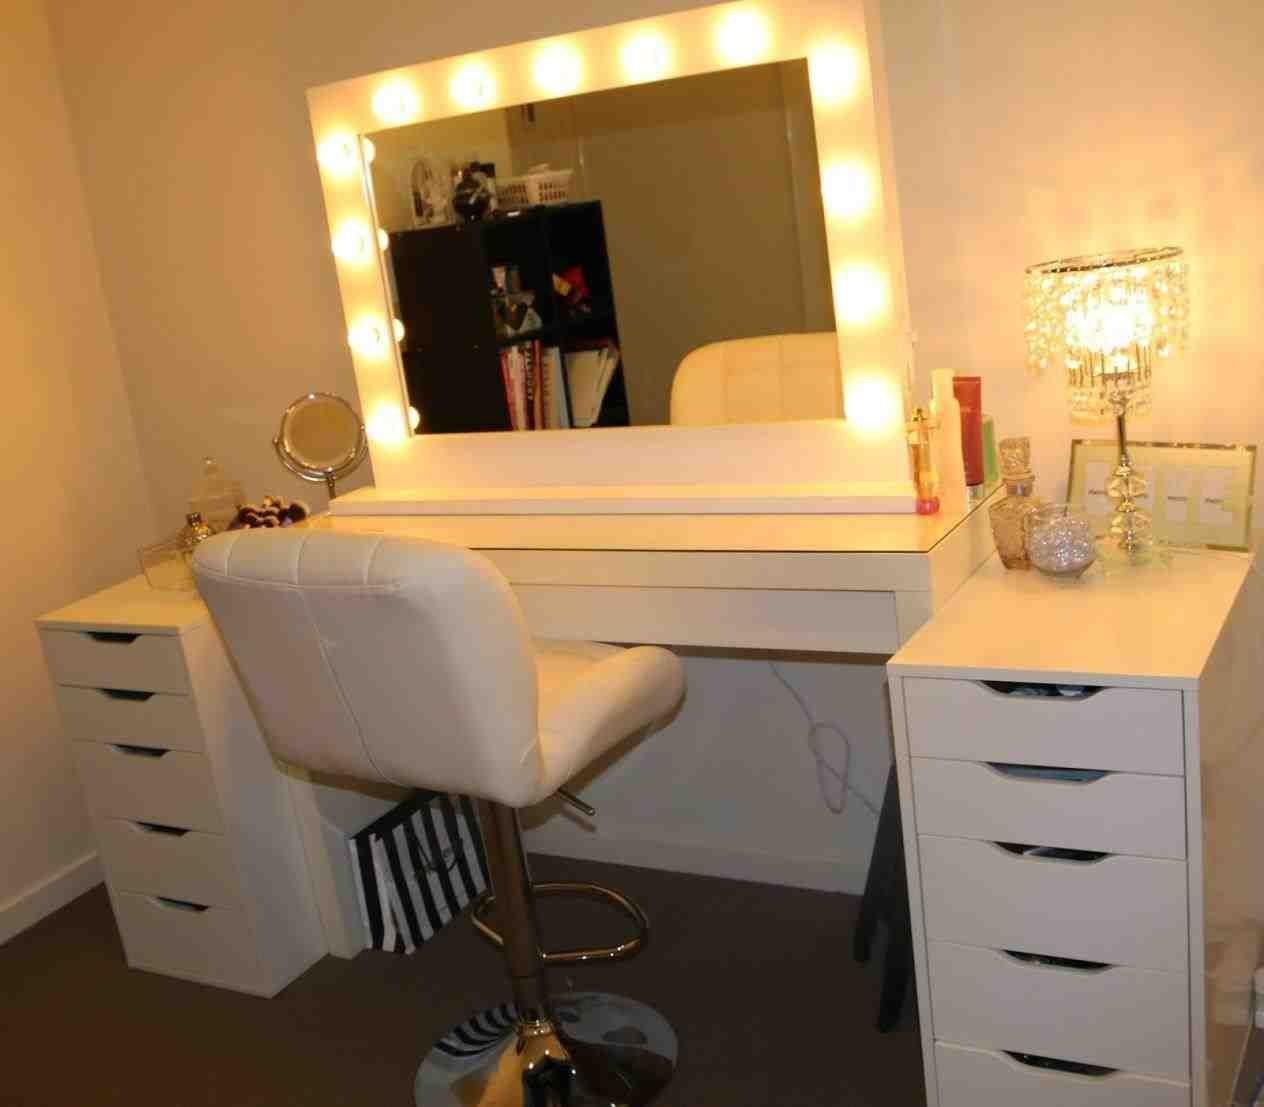 Bedroom Vanities for Sale Awesome This Diy Makeup Vanity Desk Bedroom Vanity Mirror with